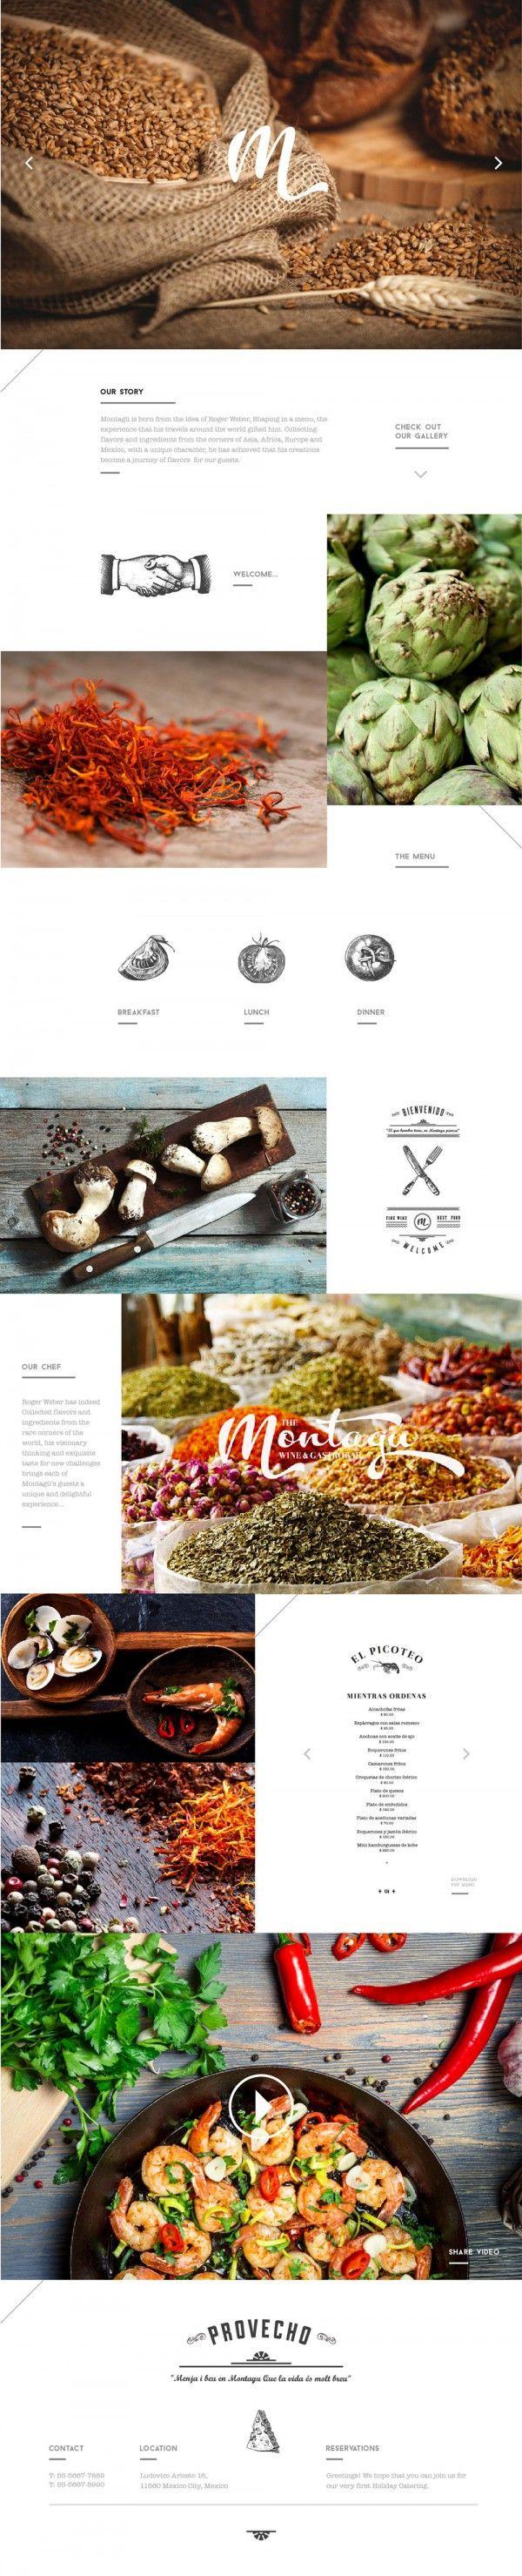 montagu-gastro-winebar-branding-5